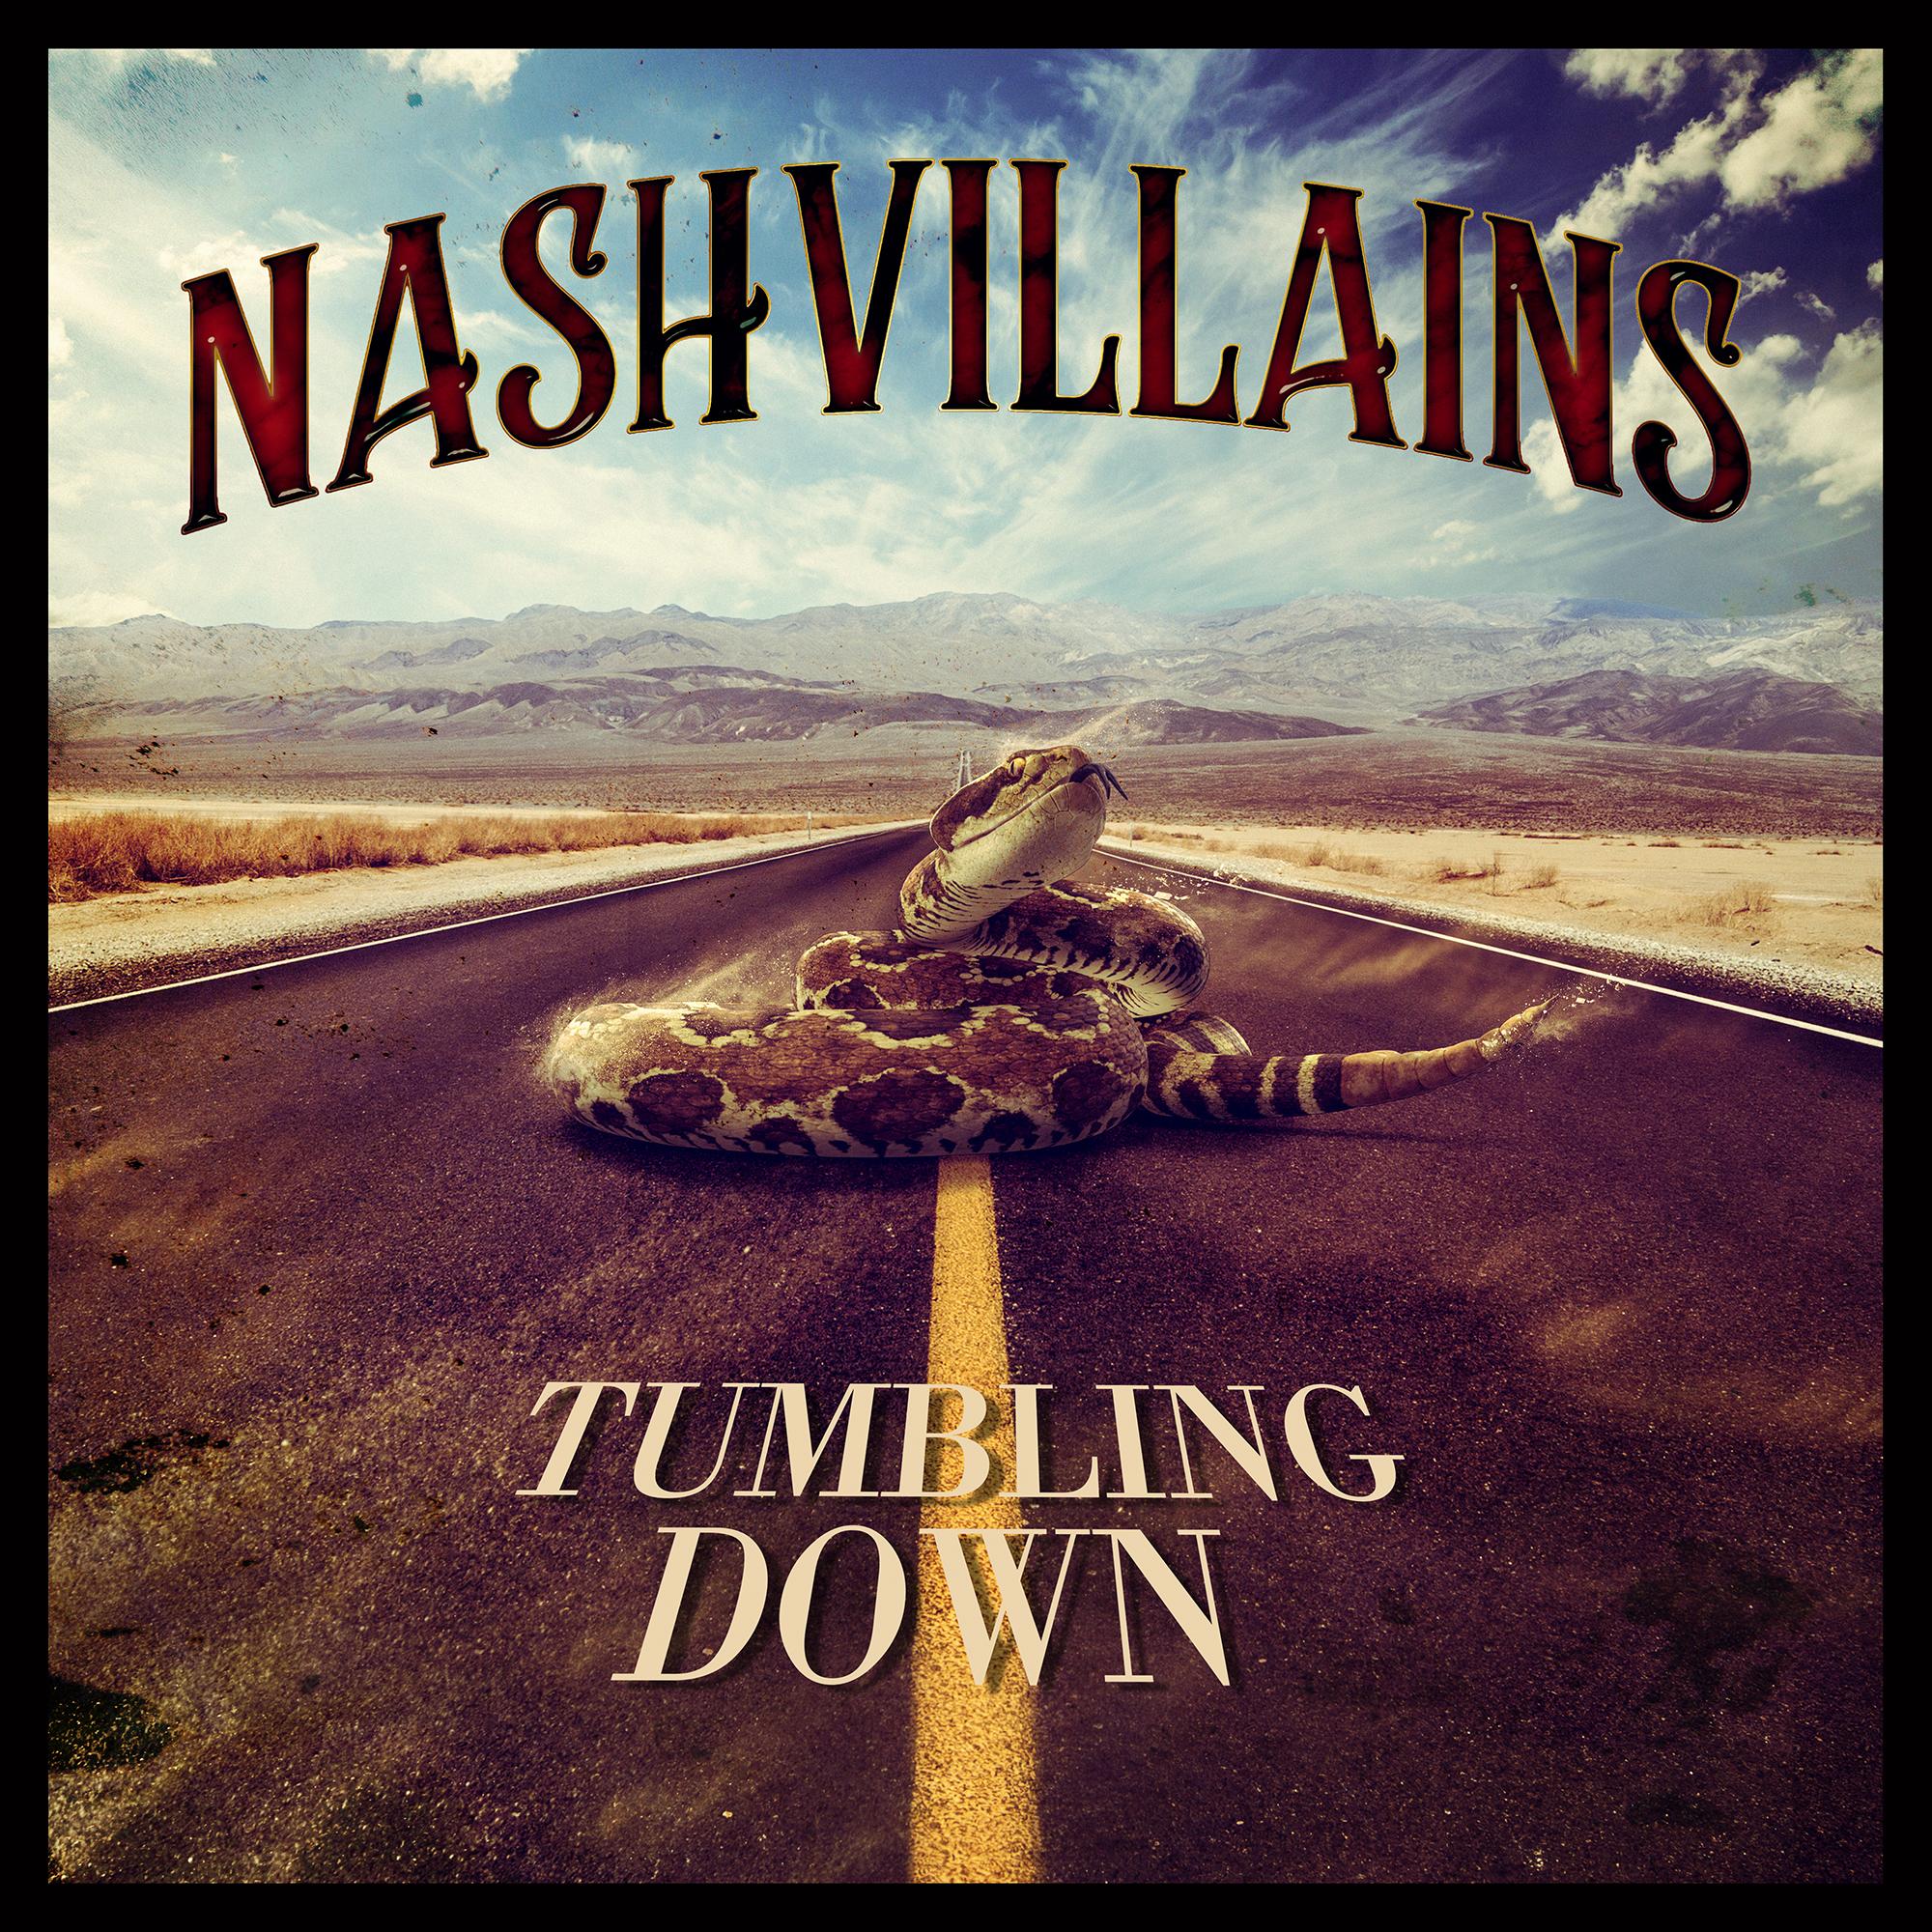 Tumbling Down